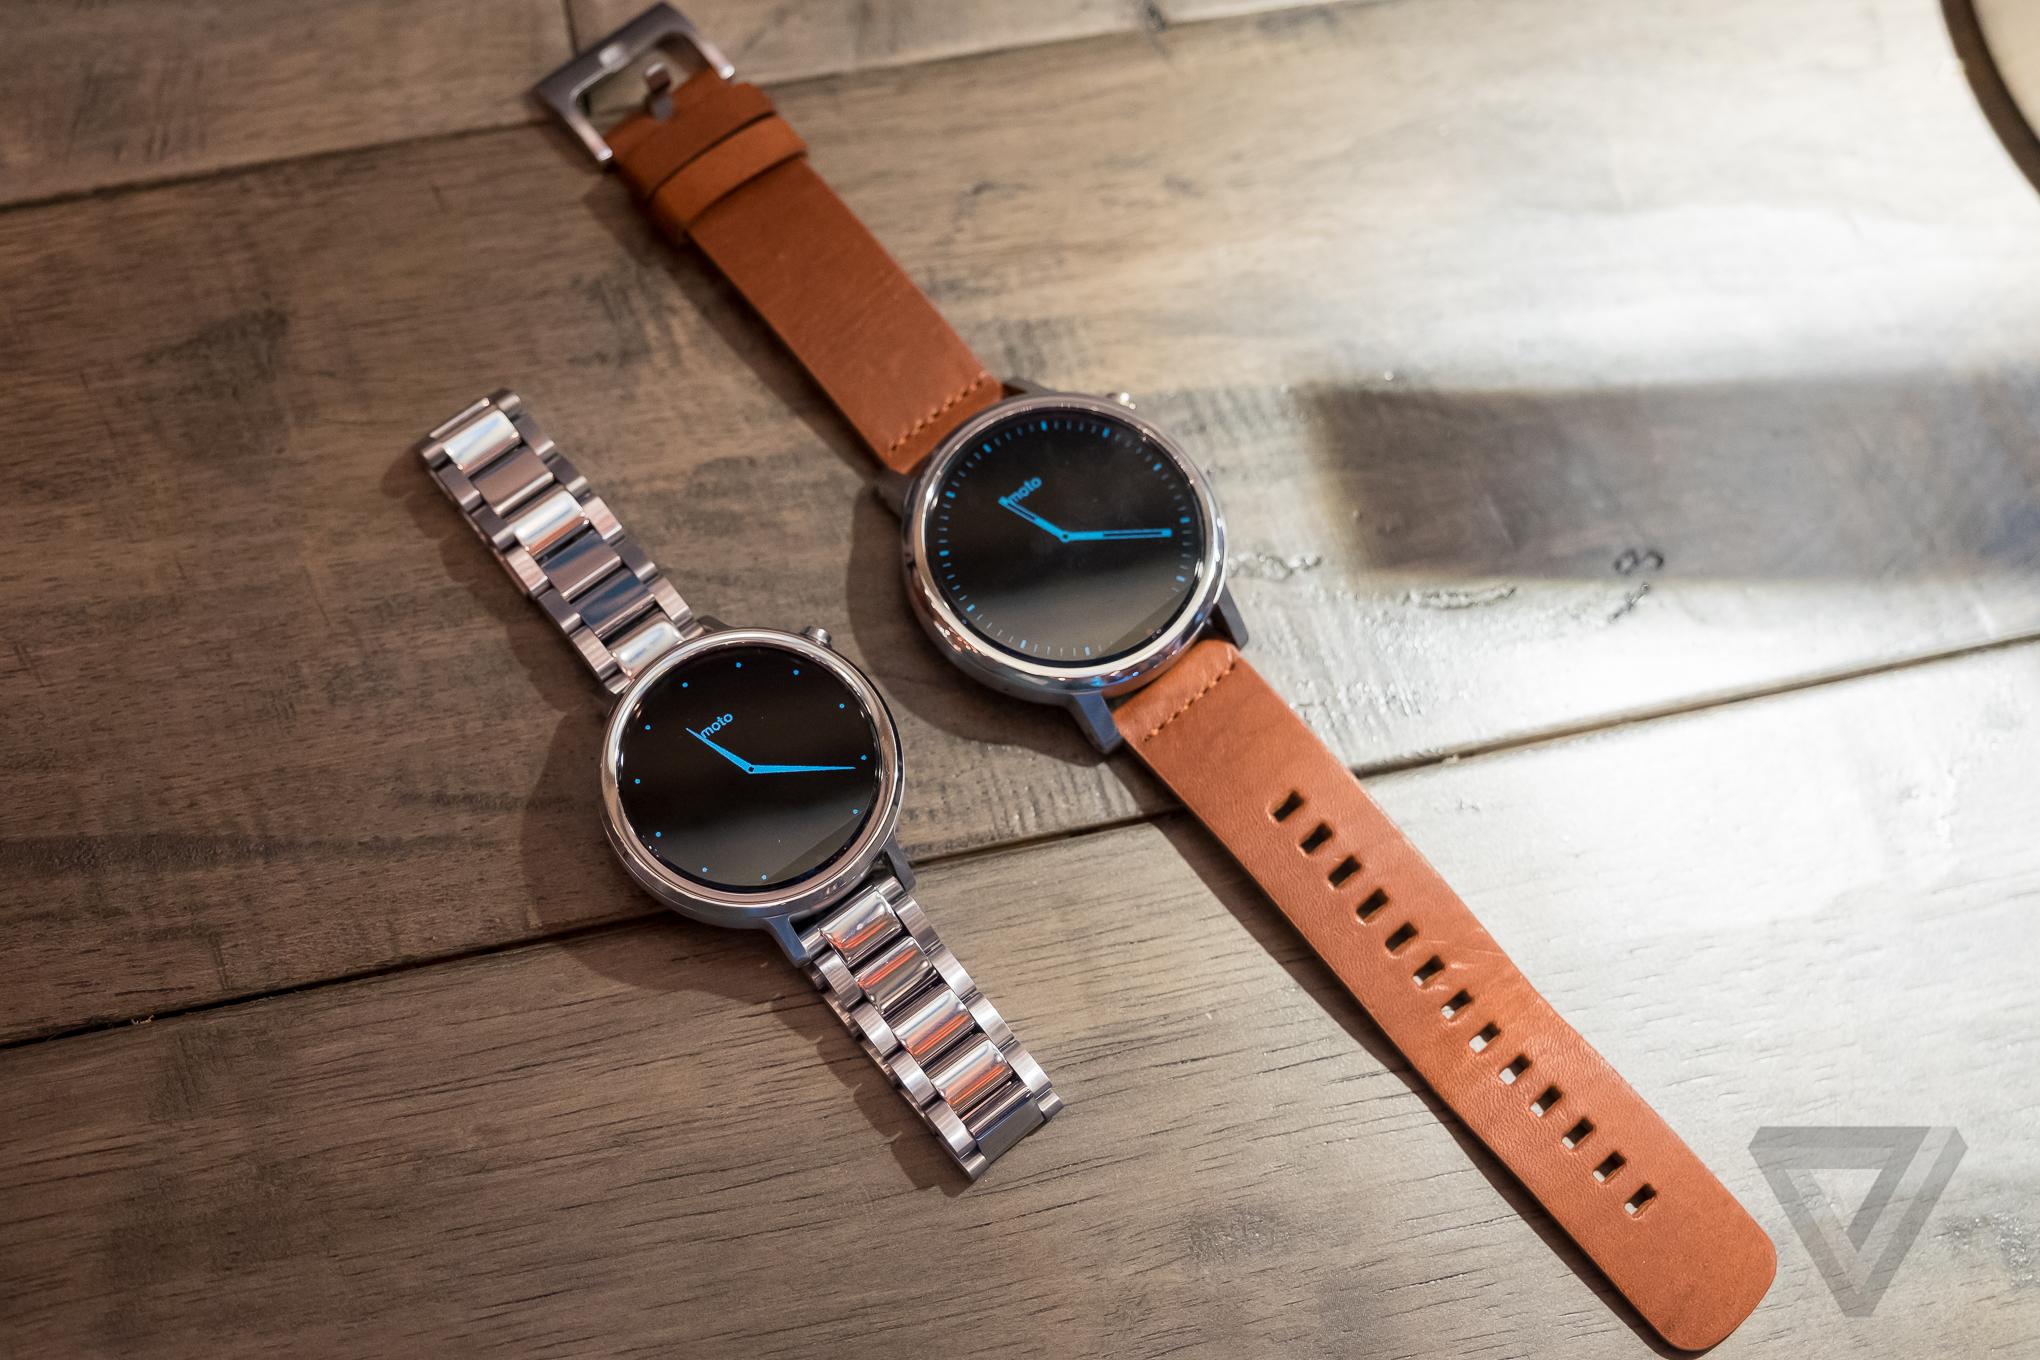 4d0e1a68454 Techmeme  Lenovo s Moto says it doesn t plan on releasing a new smartwatch  in the near future (Dan Seifert The Verge)